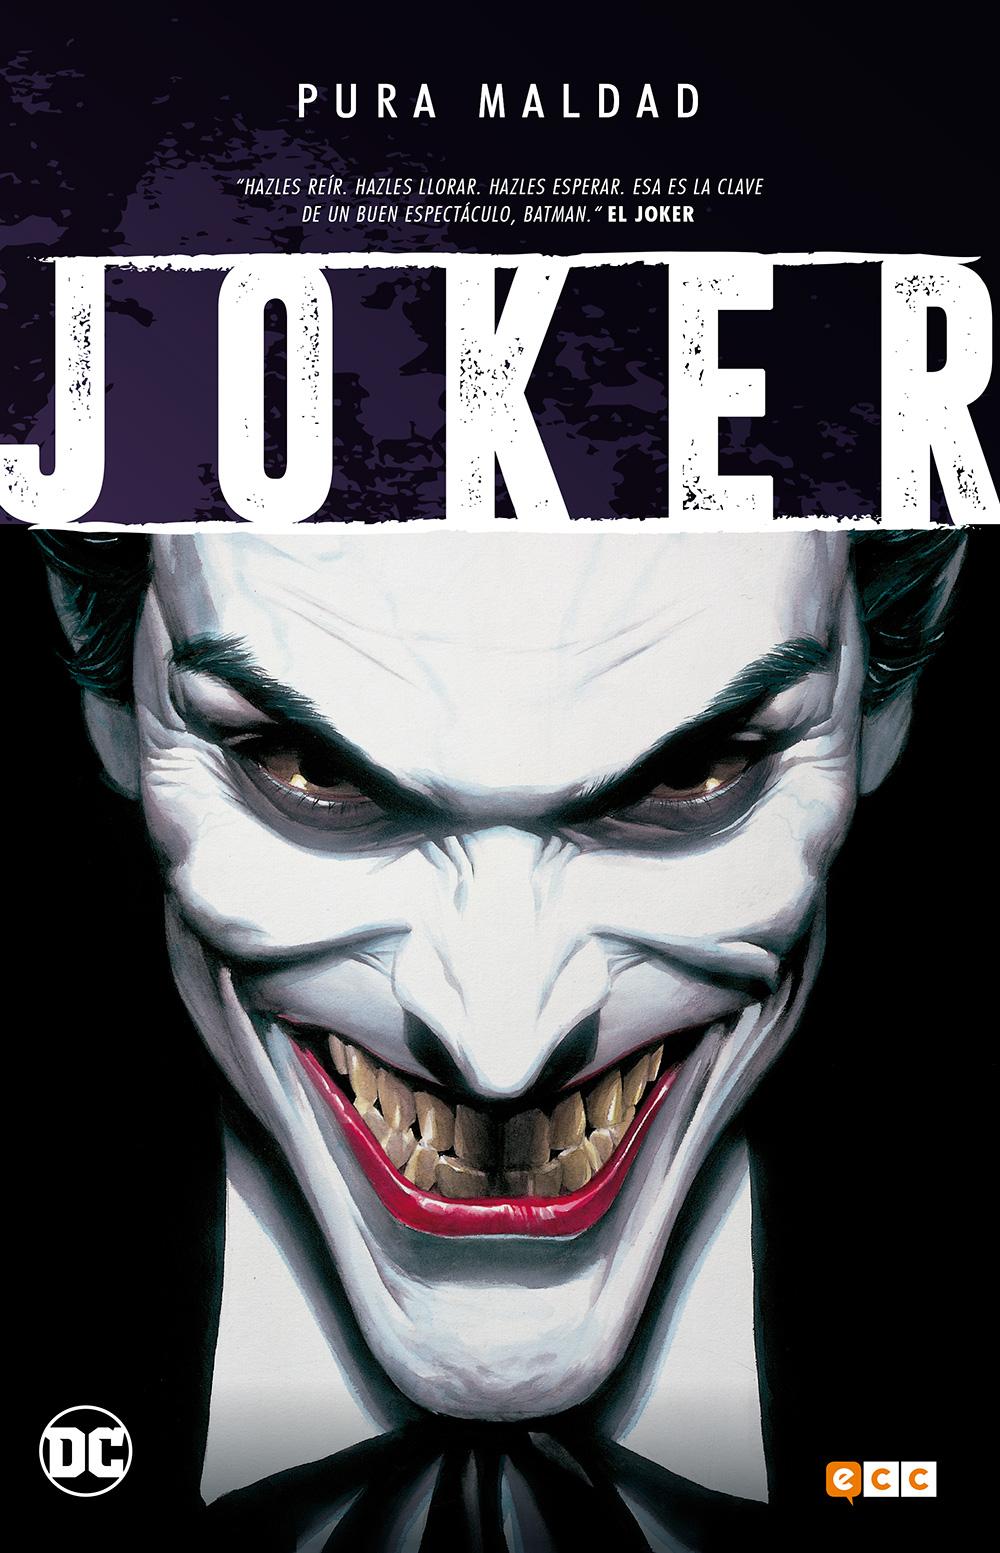 Pura Maldad Joker Payasos Y Funerales Ecc Comics